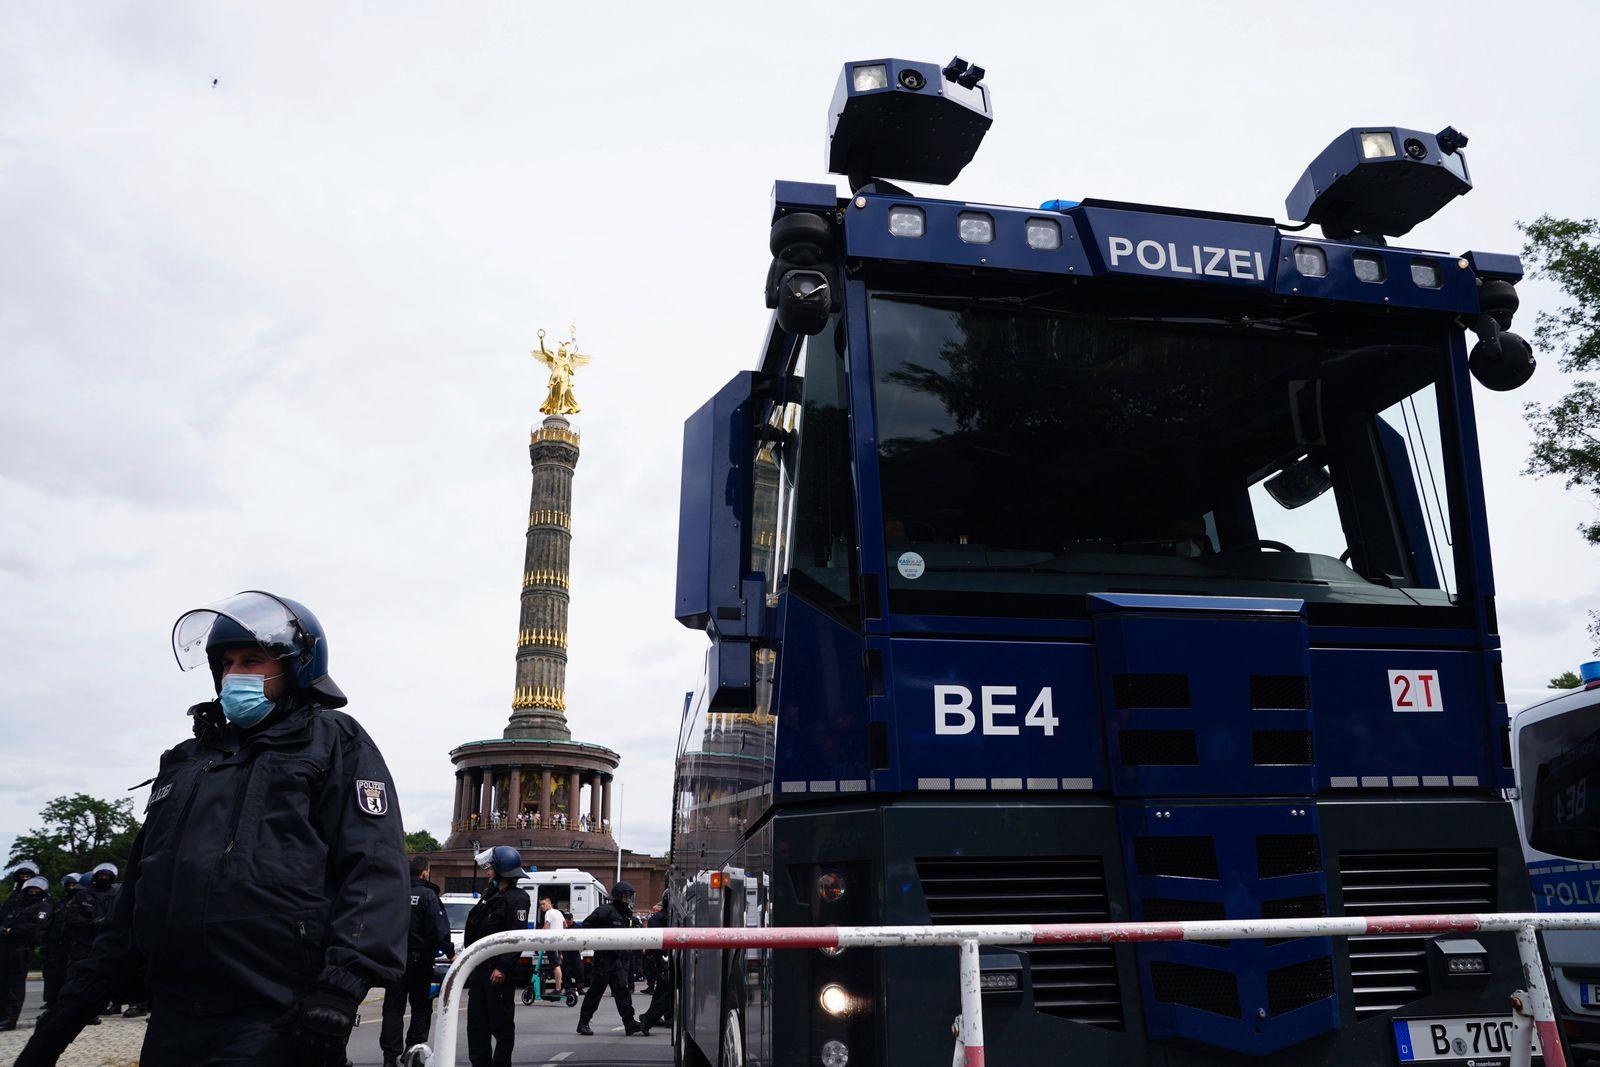 Unannounced demonstrations against Coronavirus measures despite ban in Berlin